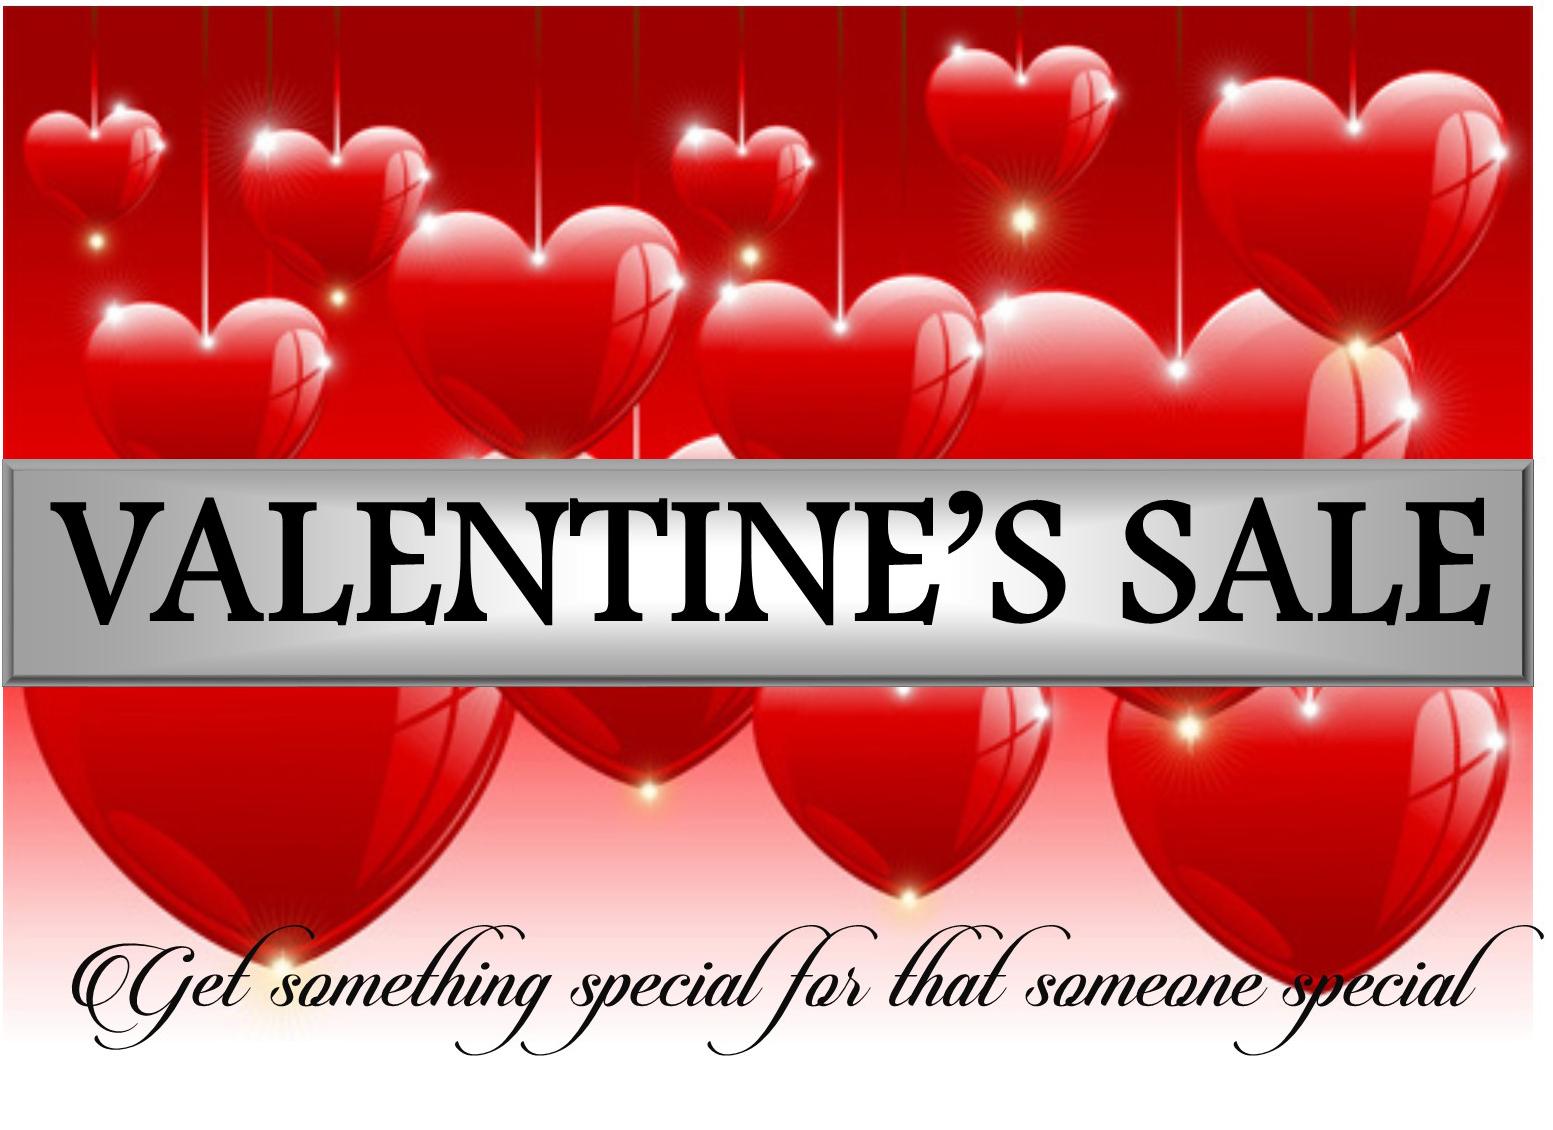 valentines-sale-sign.jpg